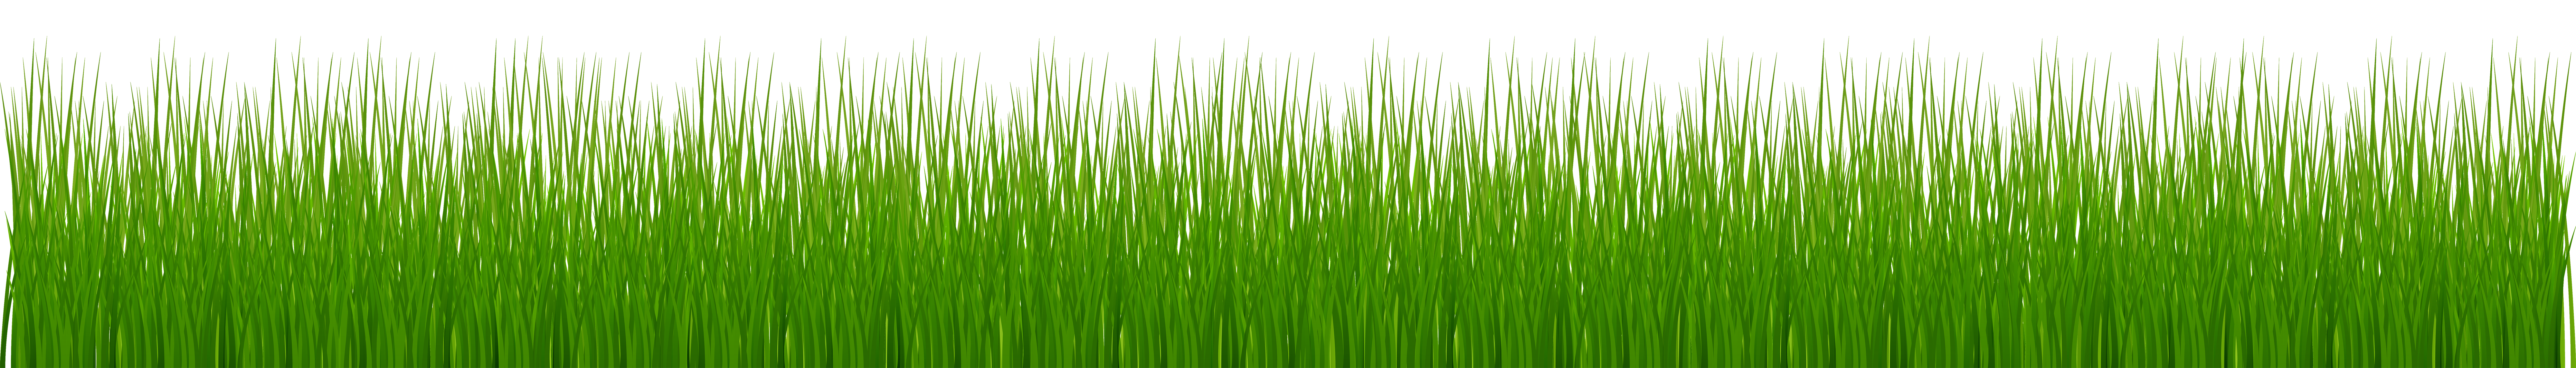 8070 Grass free clipart.